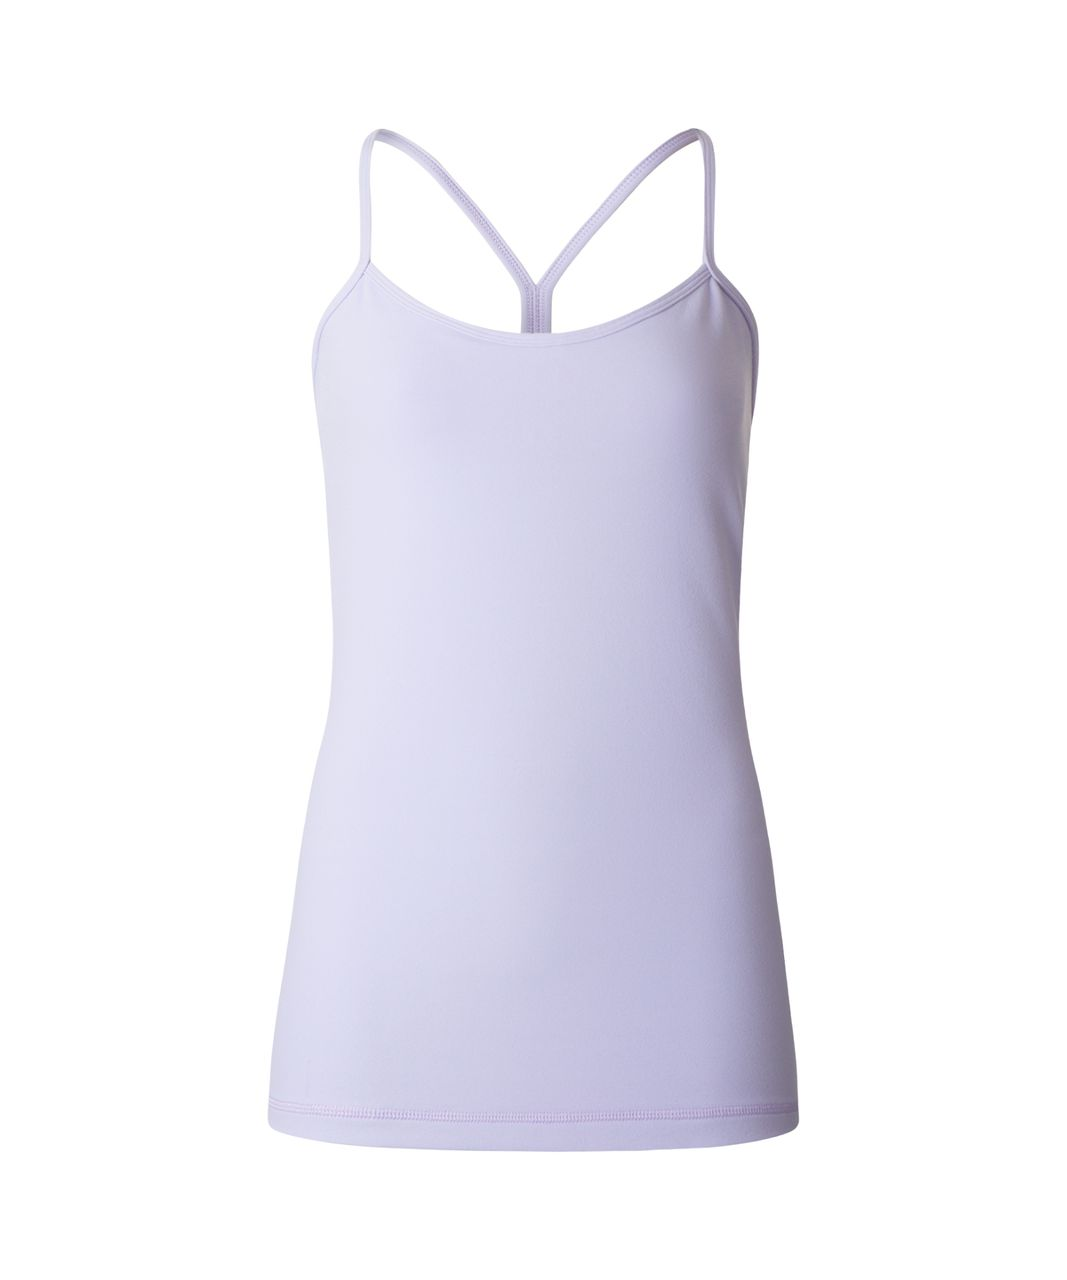 Lululemon Power Y Tank - Lilac